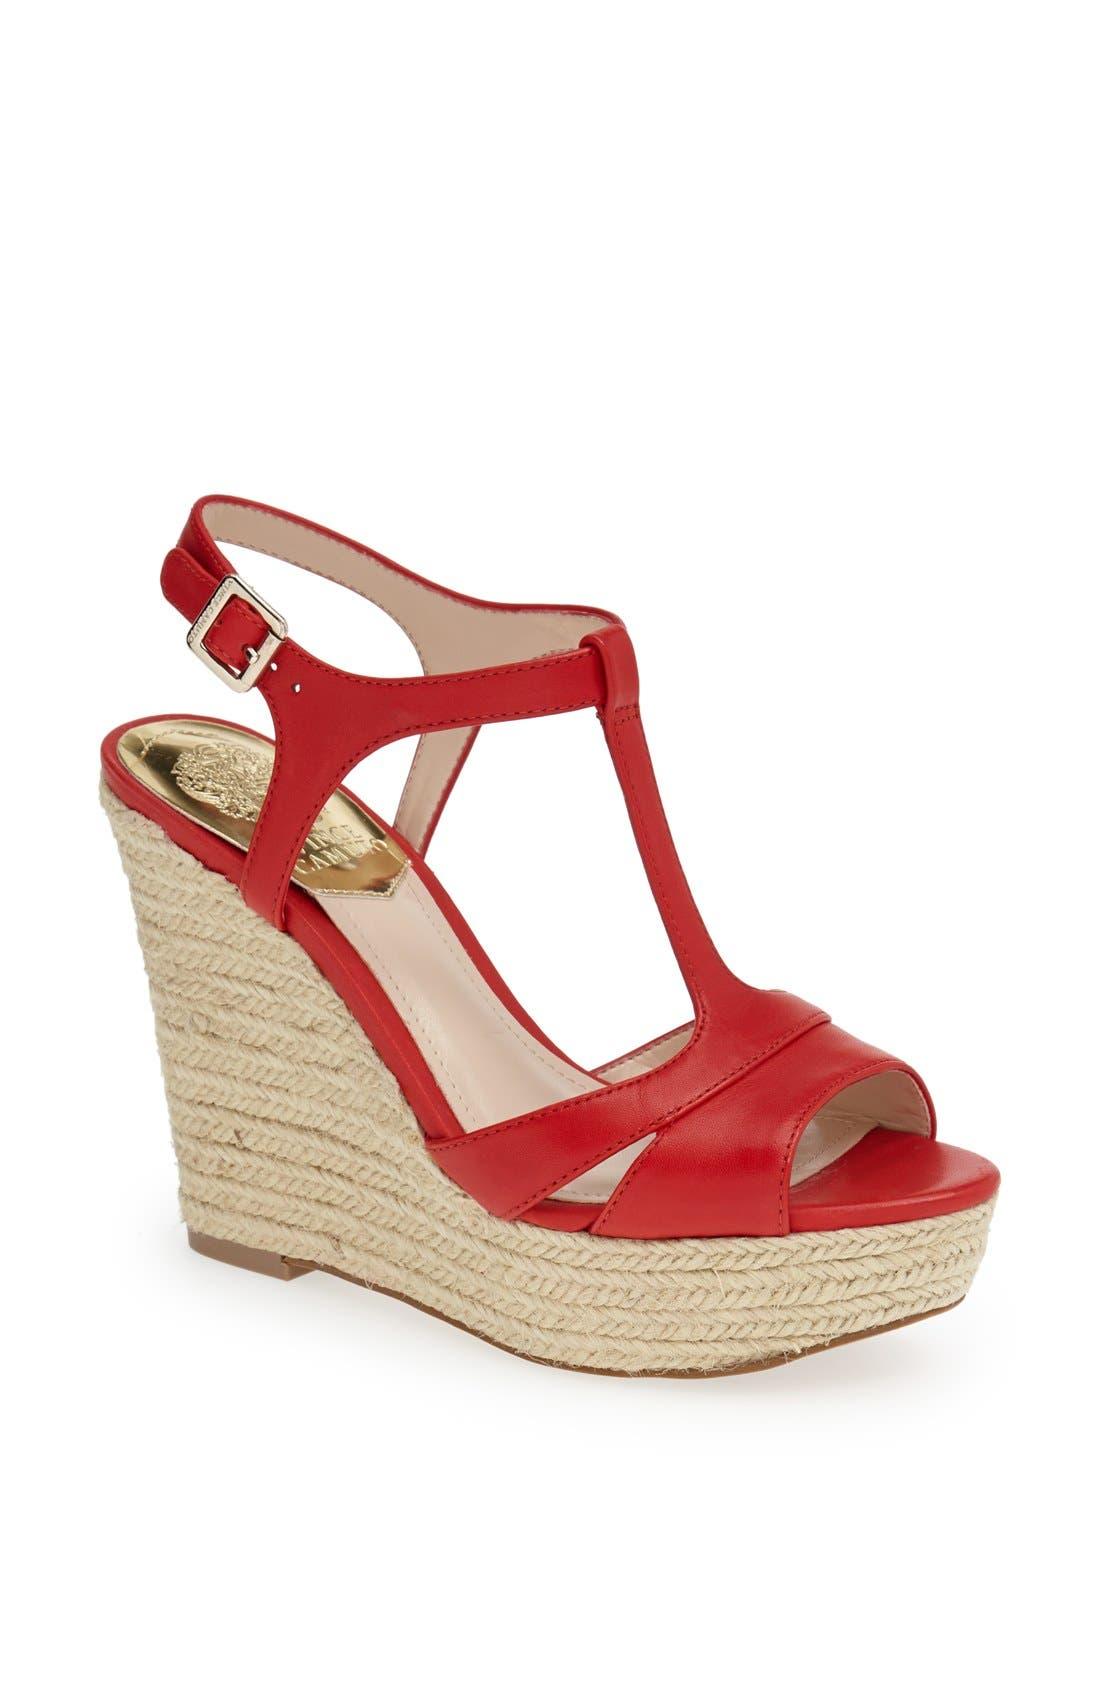 Alternate Image 1 Selected - Vince Camuto 'Inslo 2' Sandal